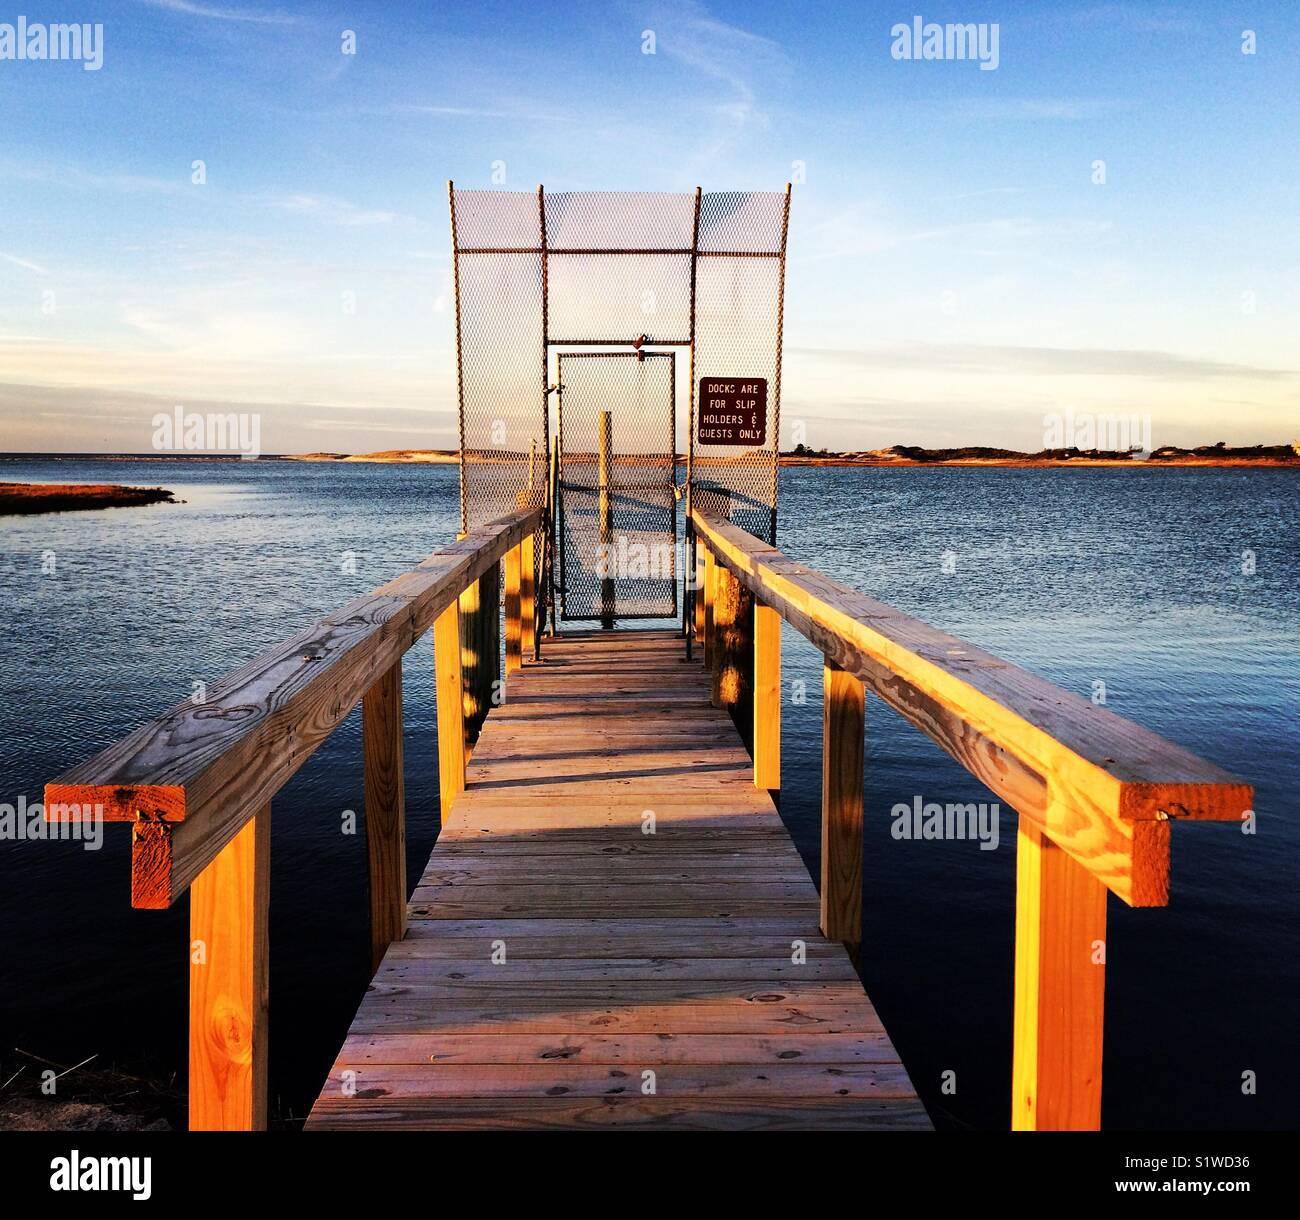 Grays Beach, Yarmouth Port, Cape Cod, Massachusetts - Stock Image